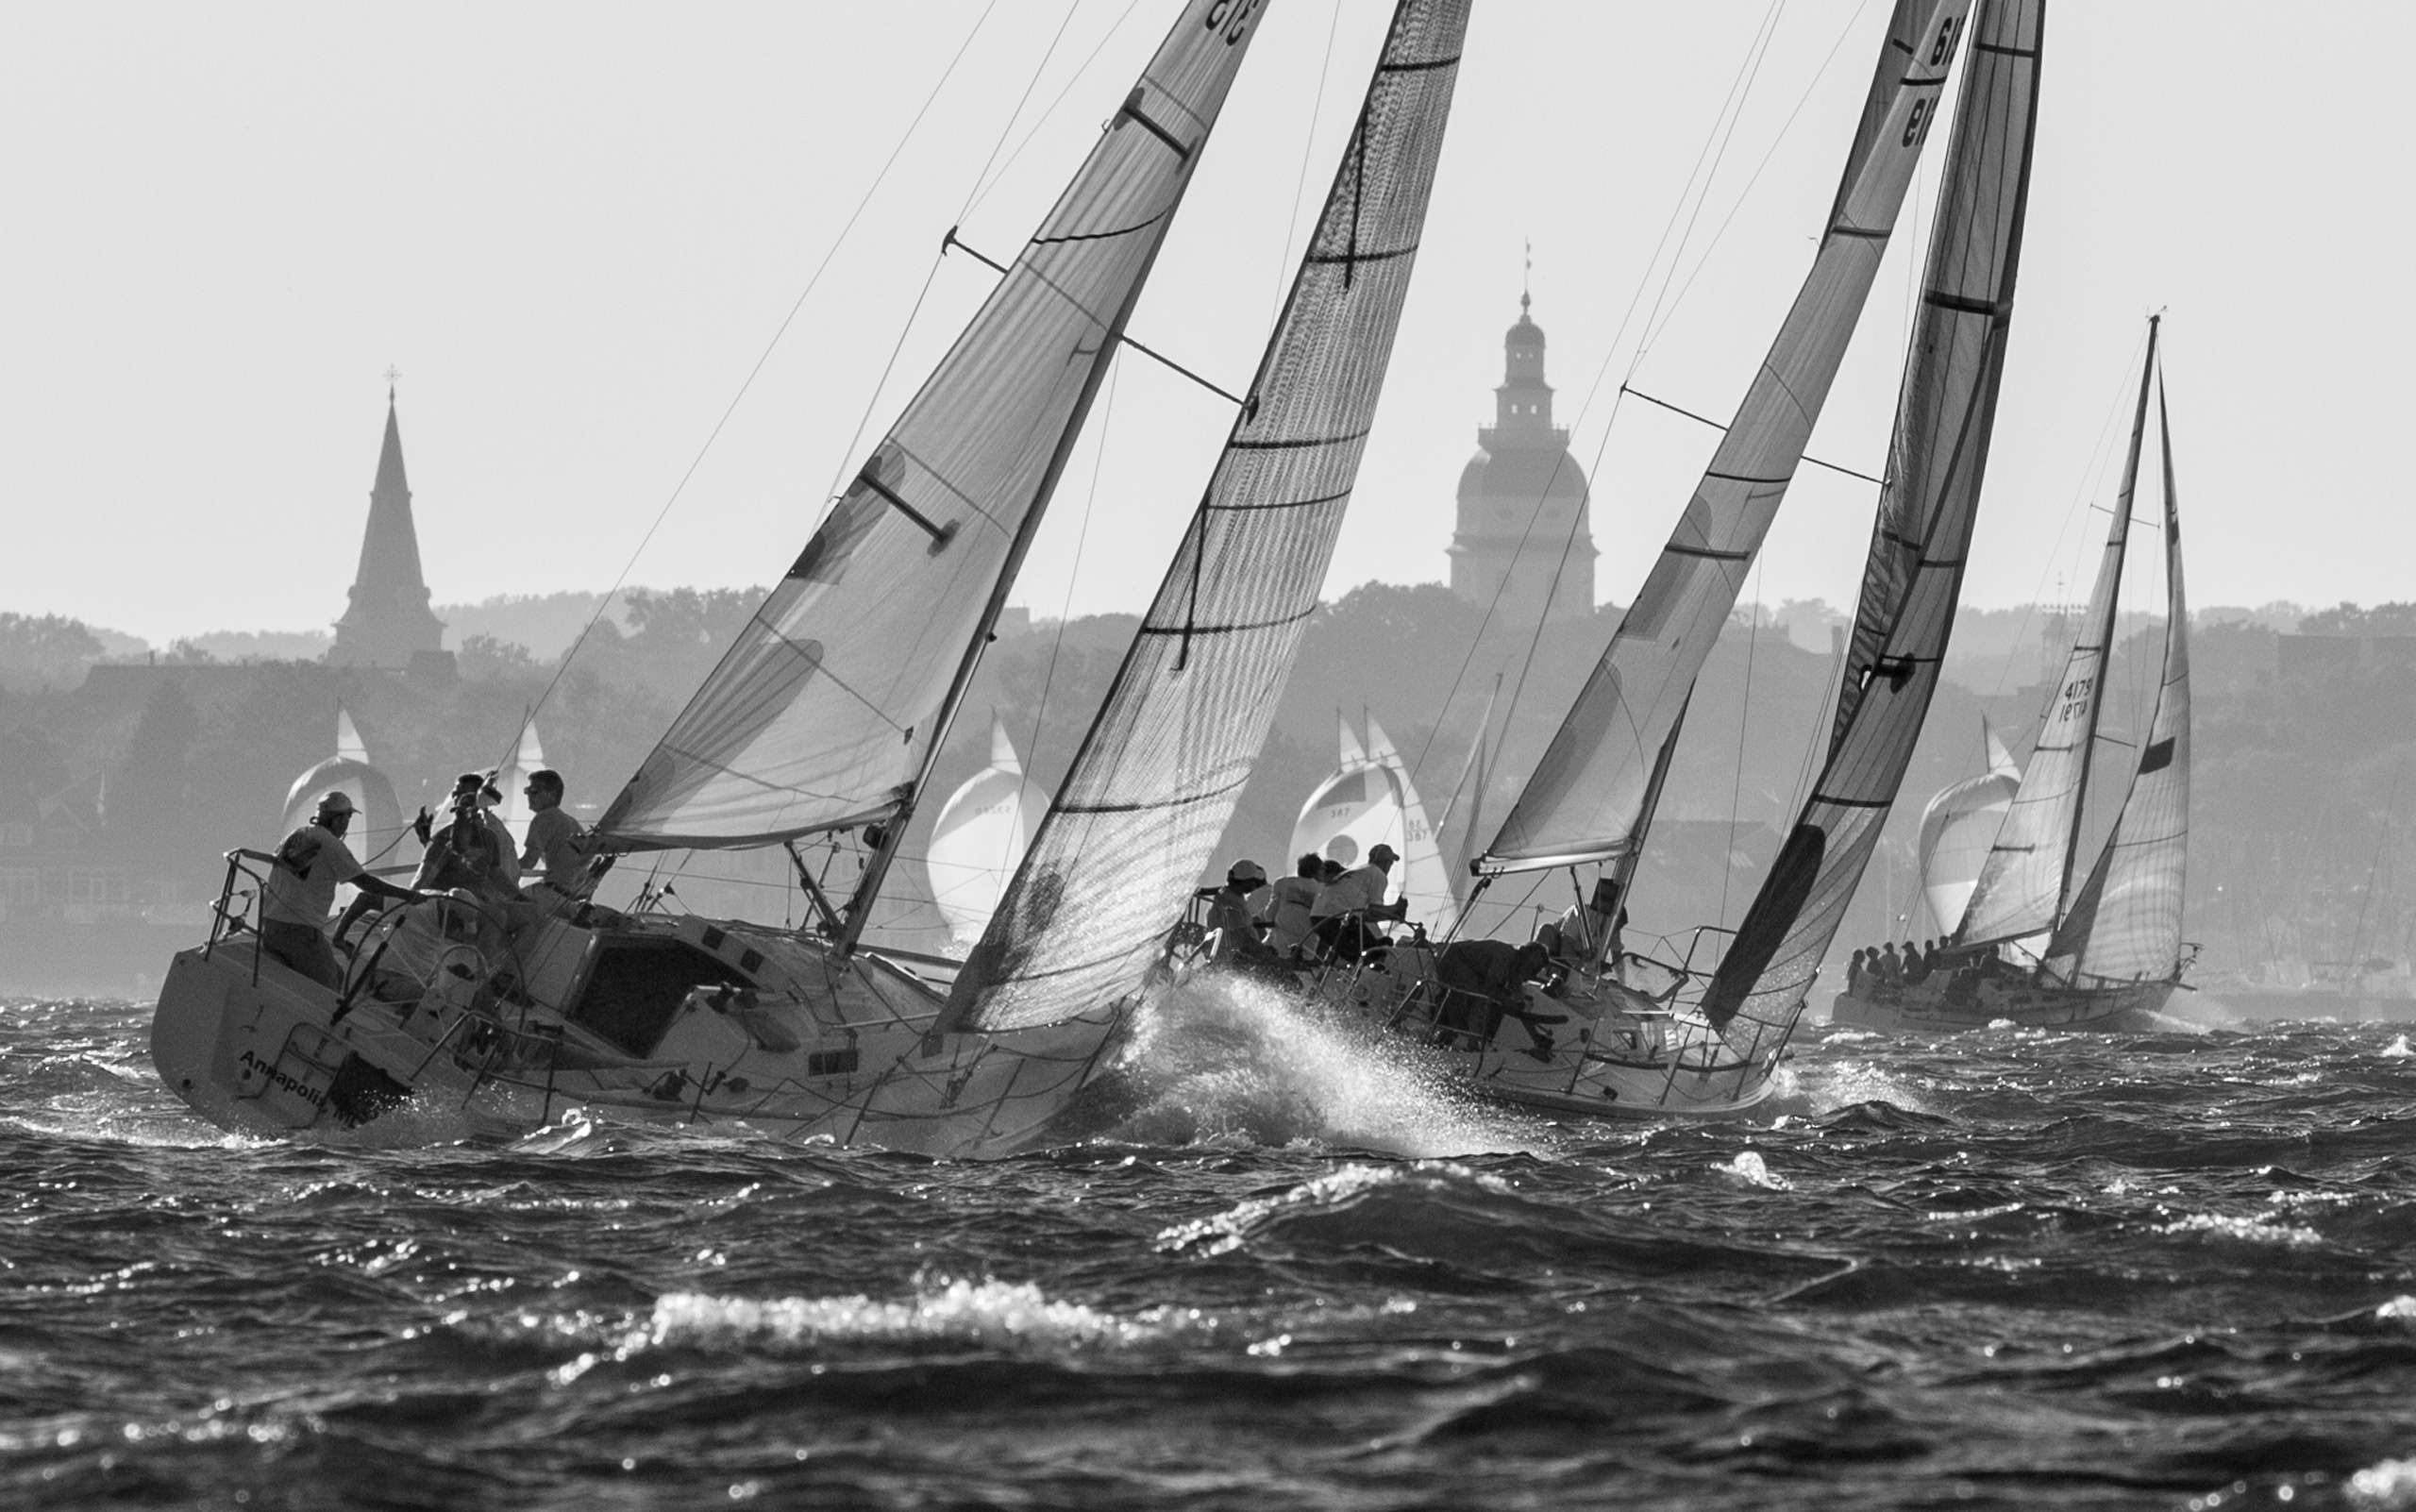 PORTFOLIO - Sailing - Chesapeake #12